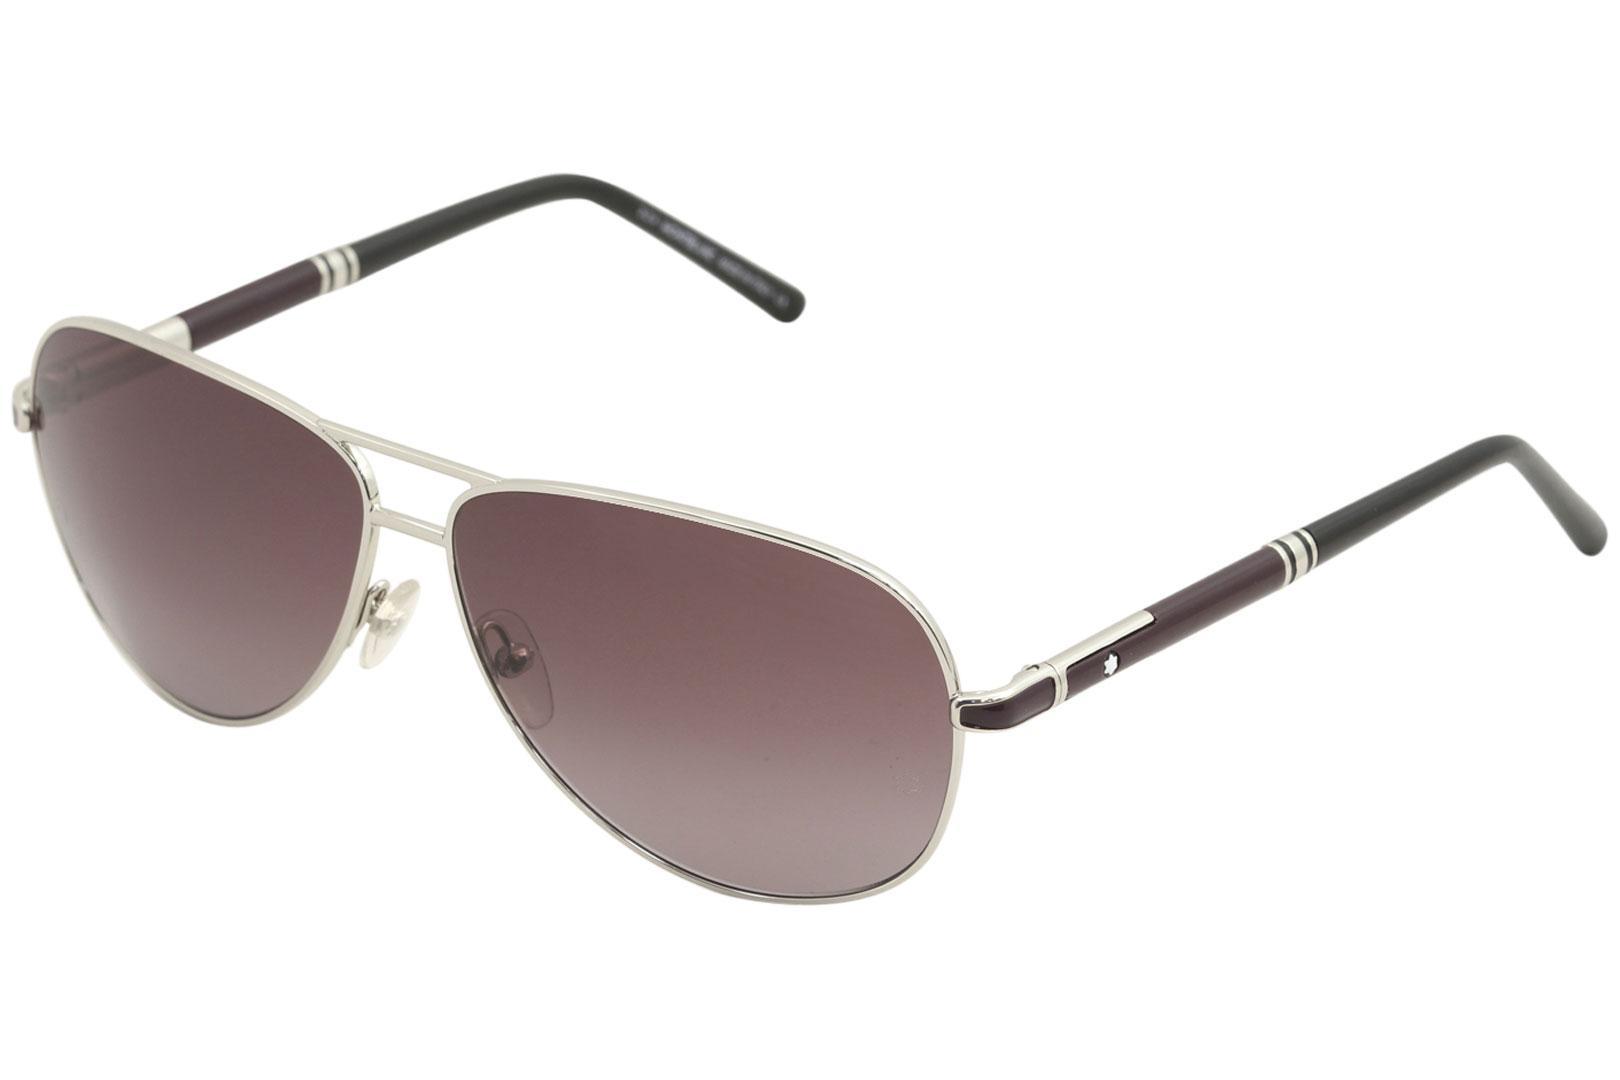 26cd019efd Mont Blanc Men s MB521S MB 521 S Fashion Pilot Sunglasses by Mont Blanc